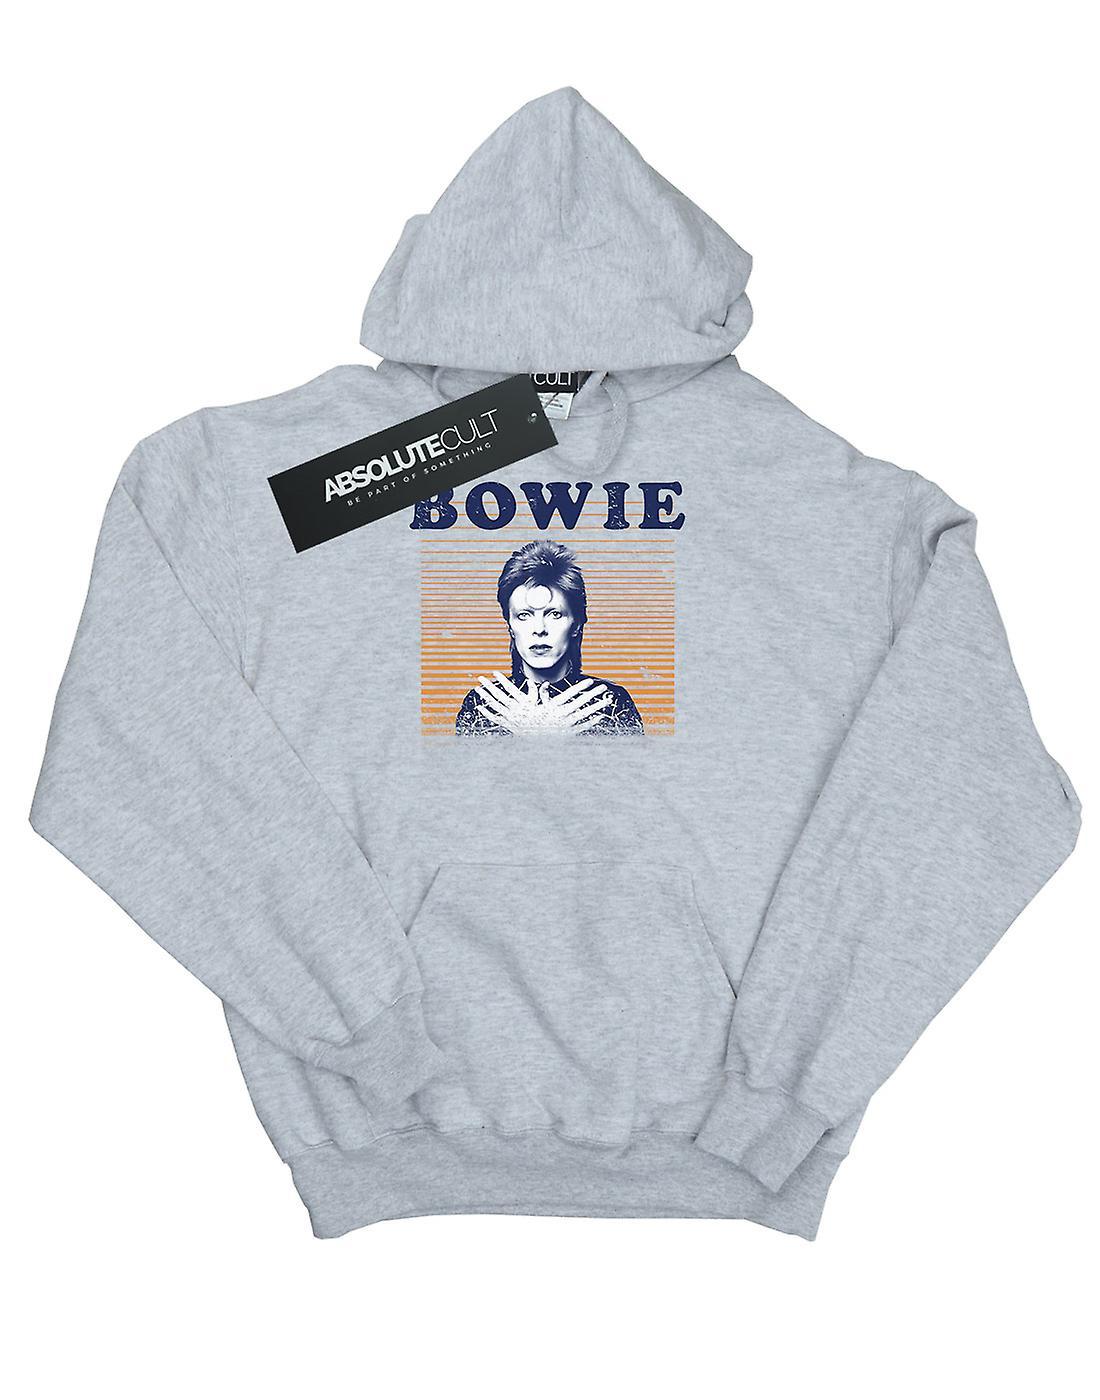 David Bowie Women's Orange Stripes Hoodie